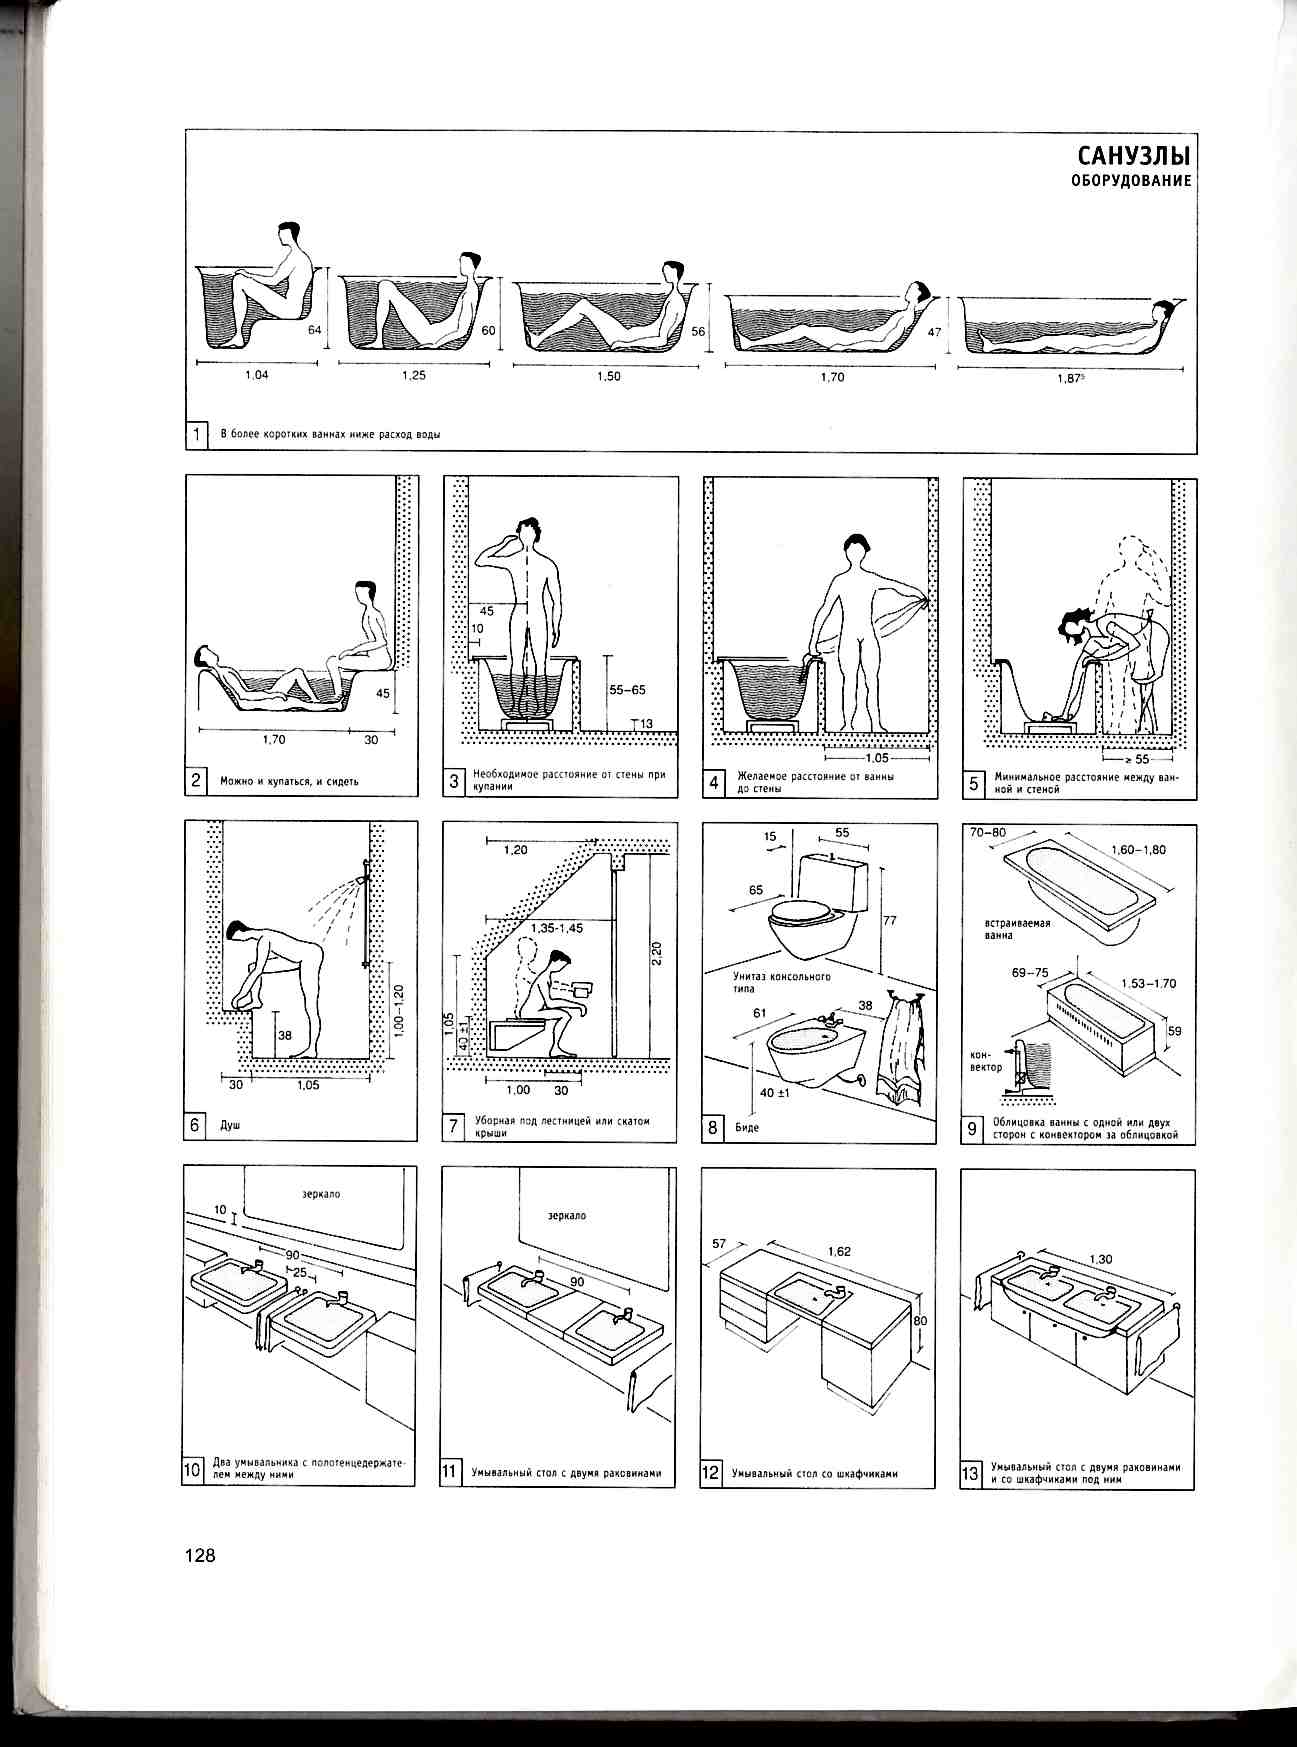 Kitchen Hand Requirements